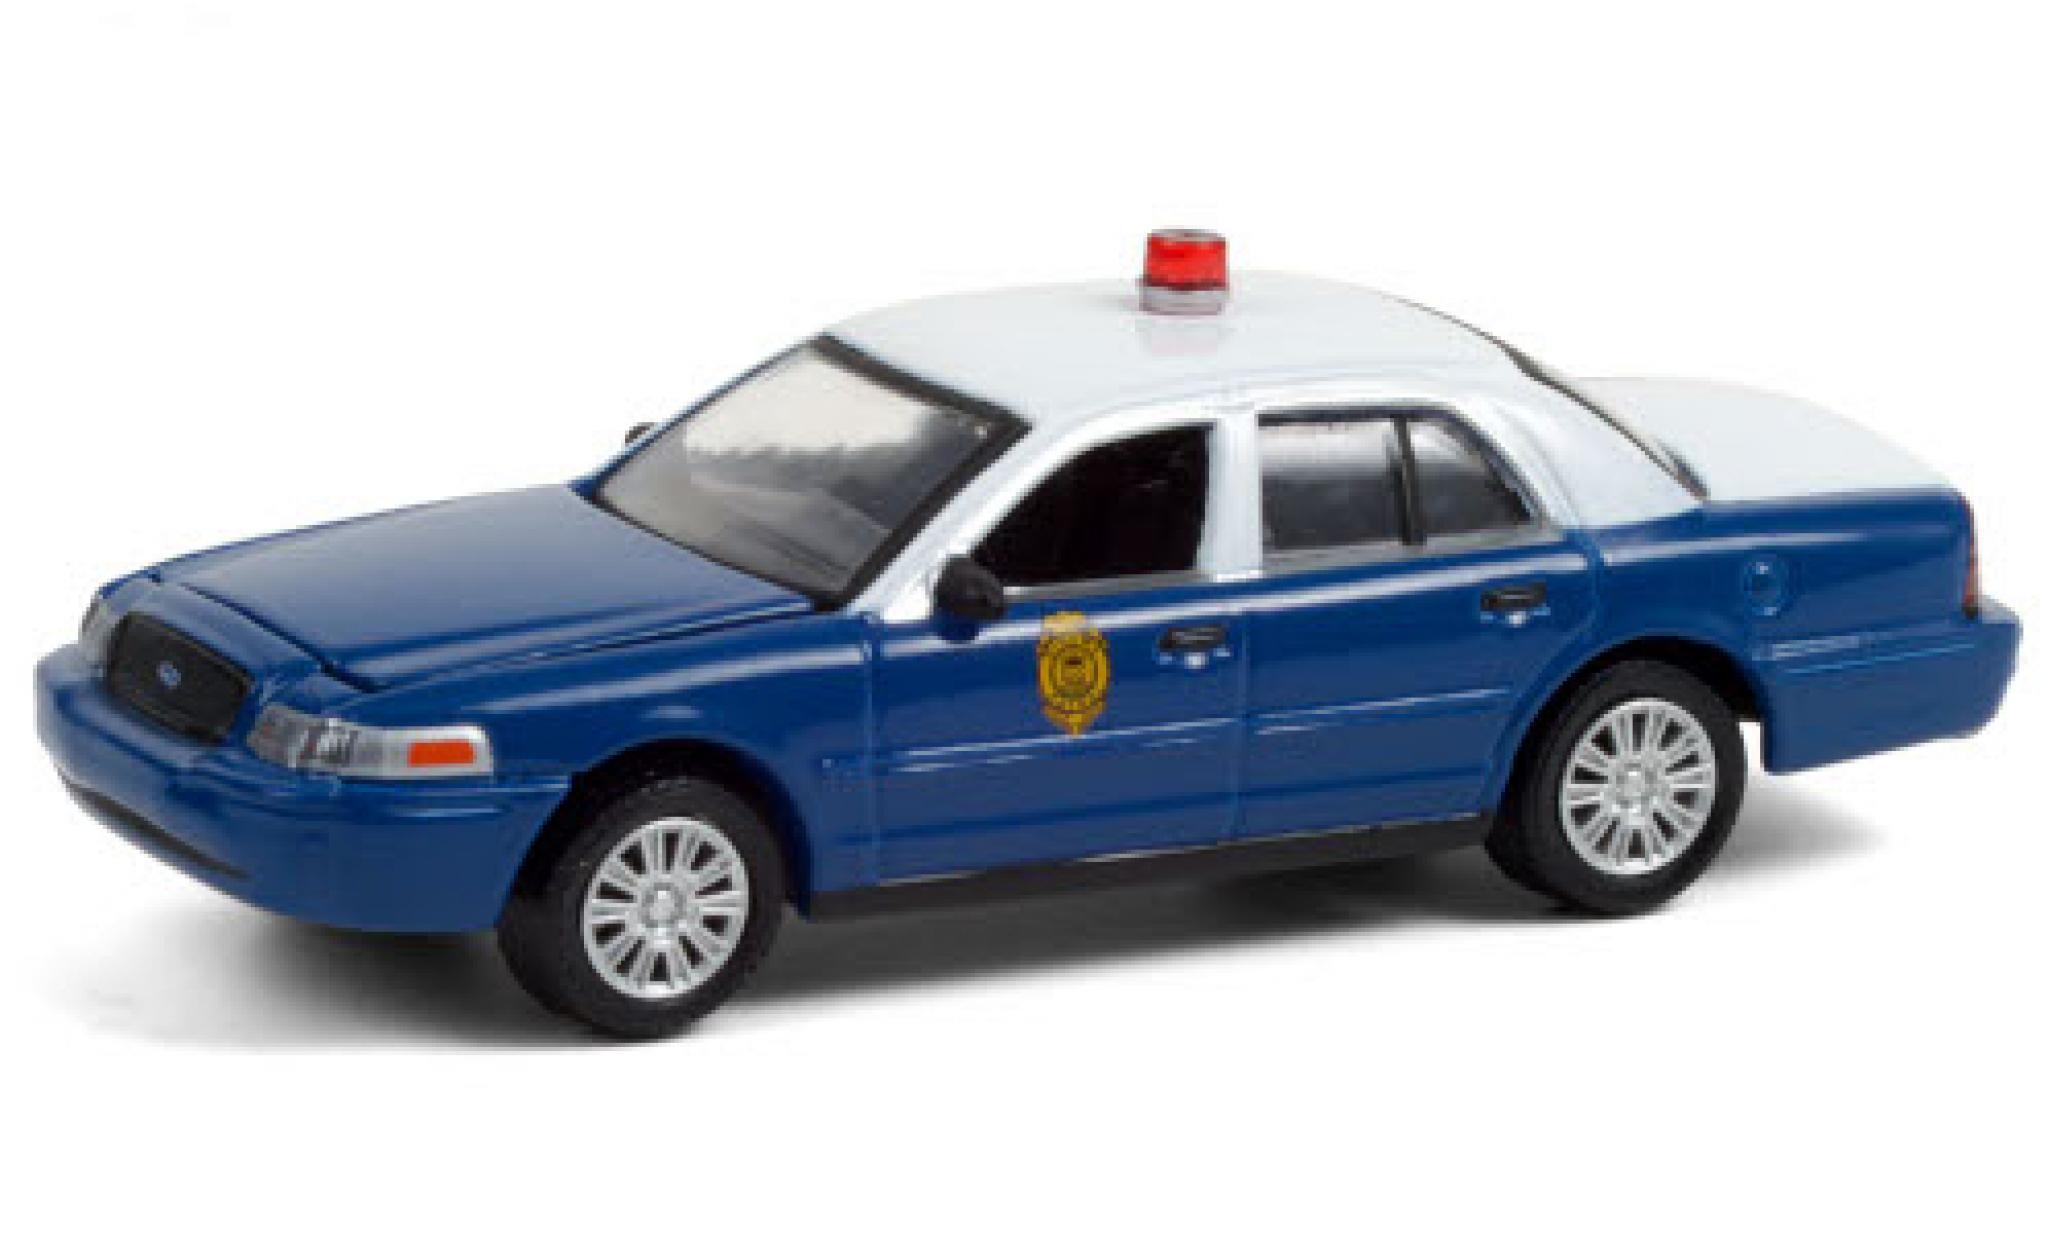 Ford Crown 1/64 Greenlight Victoria Police Interceptor Kansas Highway Patrol 2011 Kansas autoroute Patrol 75th Anniversaire